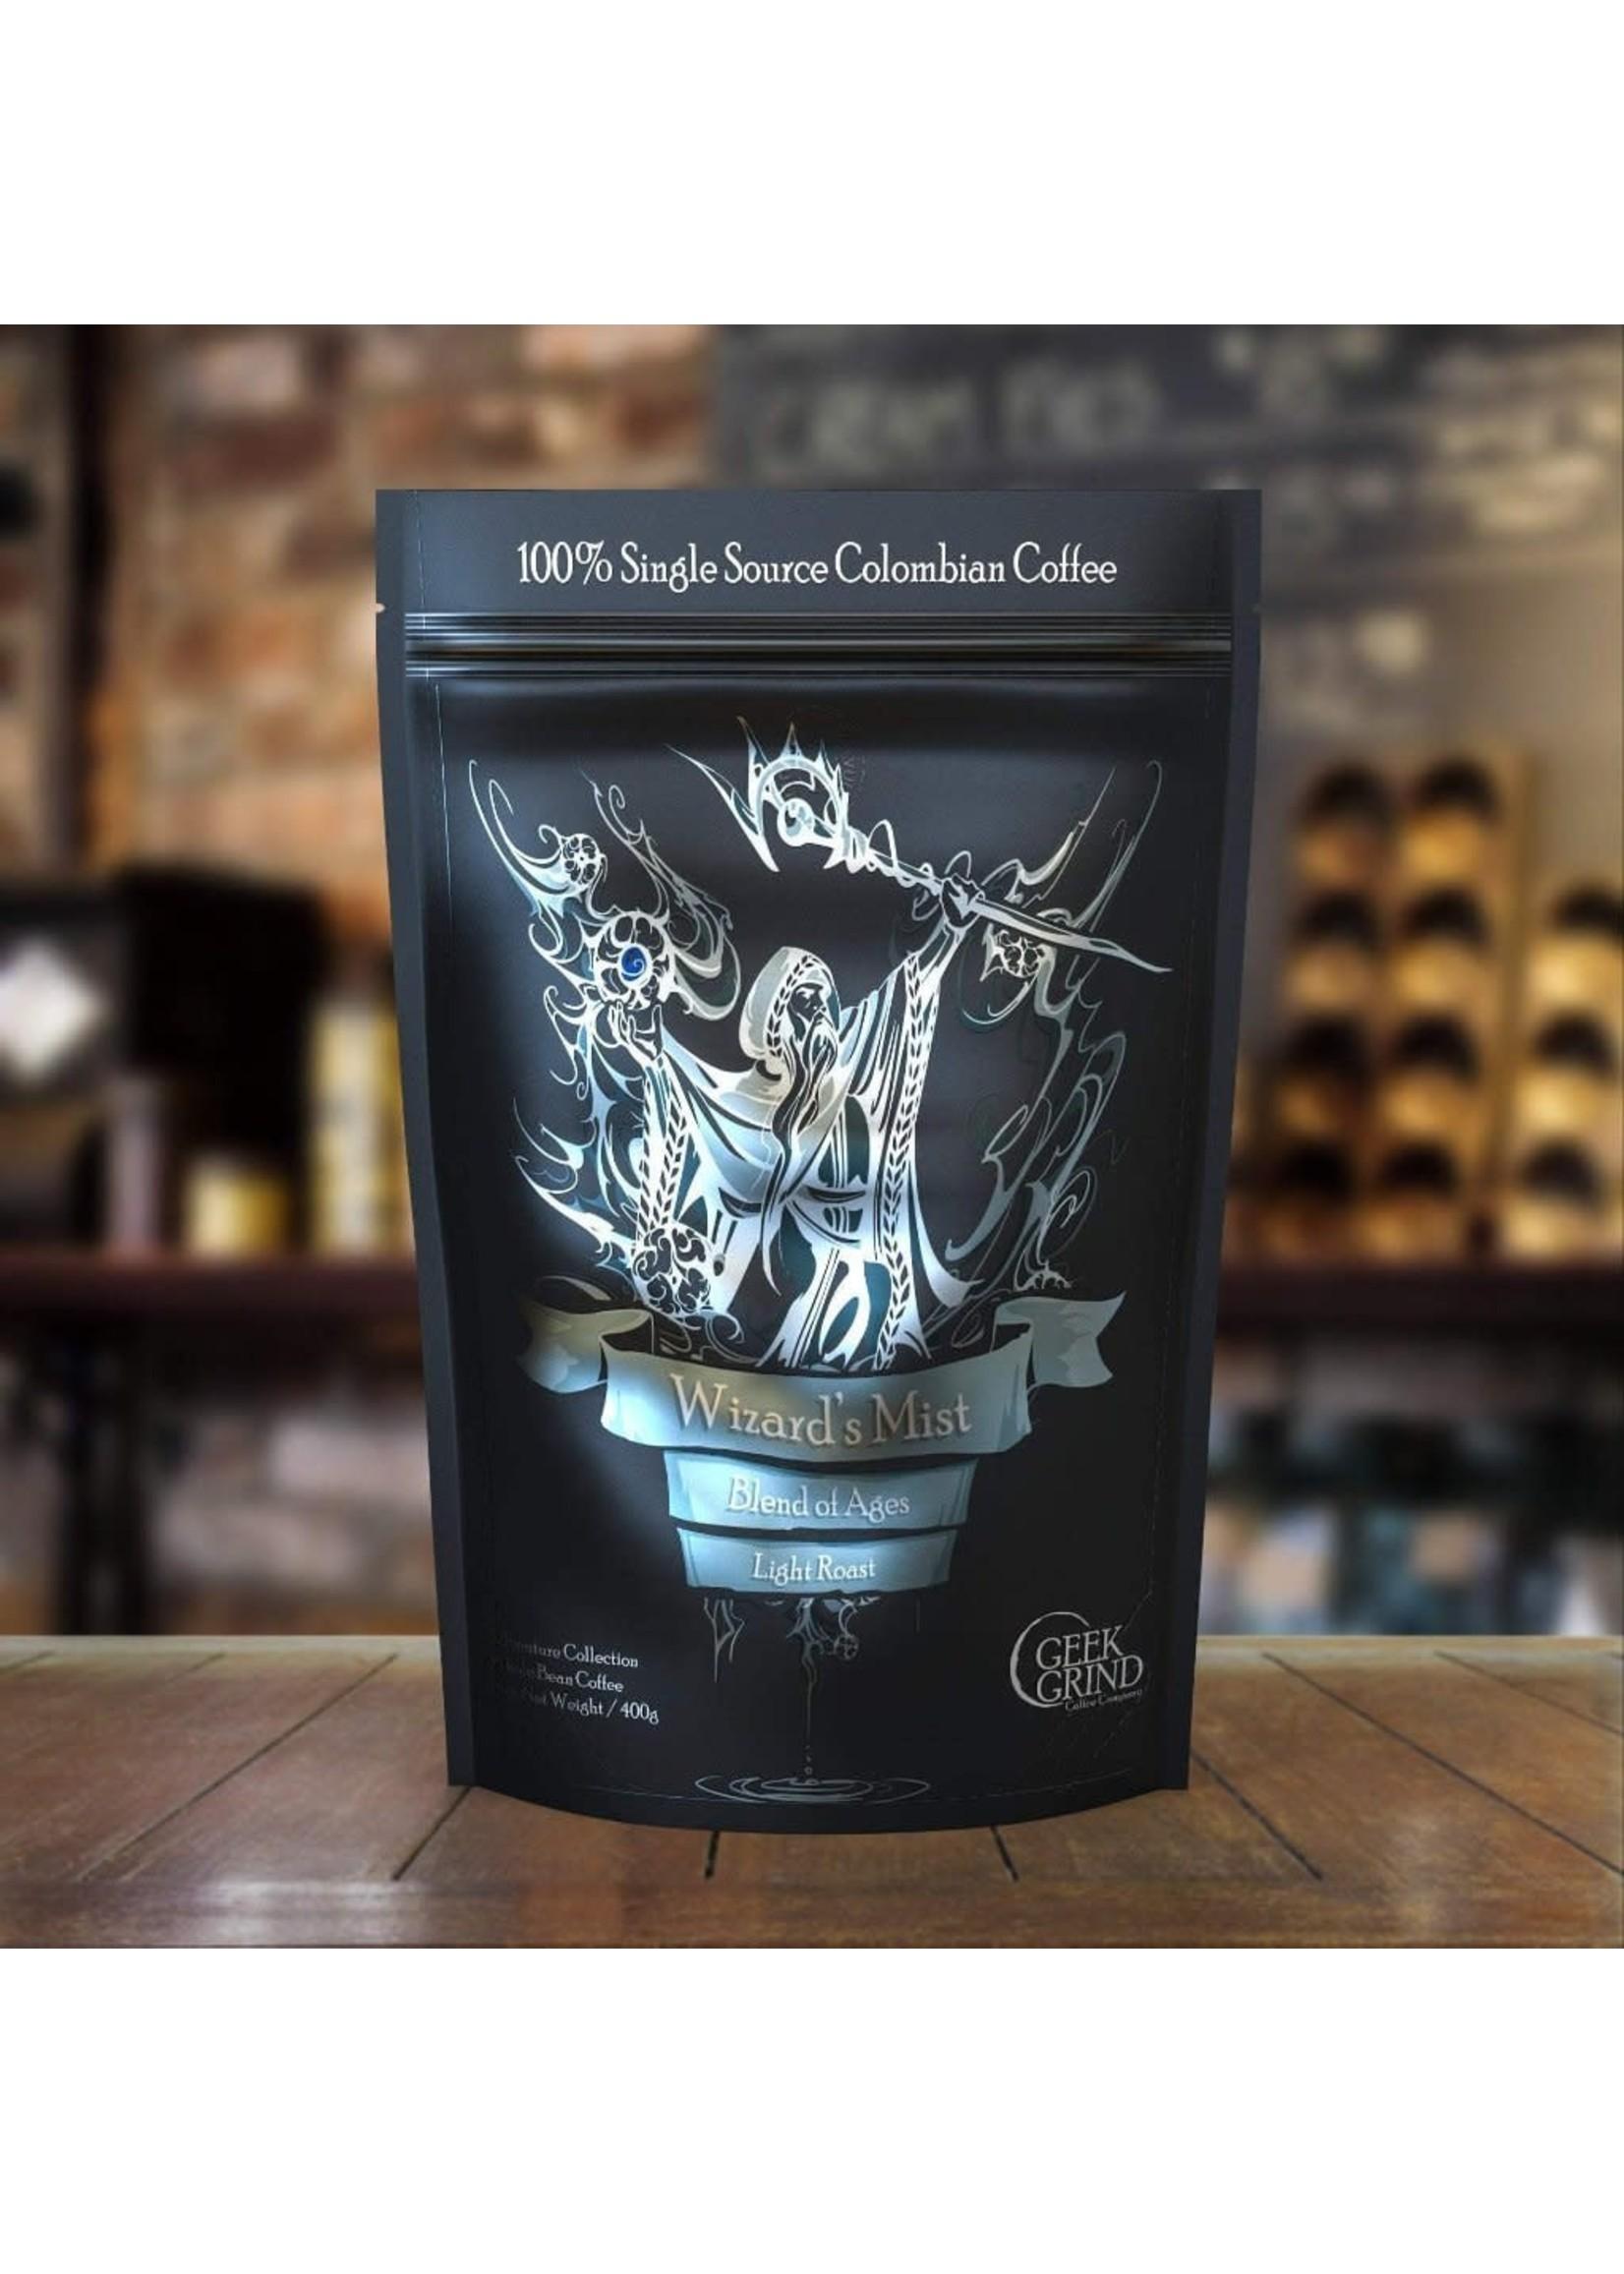 Geek Grind Wizard's Mist - Blend of Ages - Light Roast Coffee- 12 oz. Individual Bag